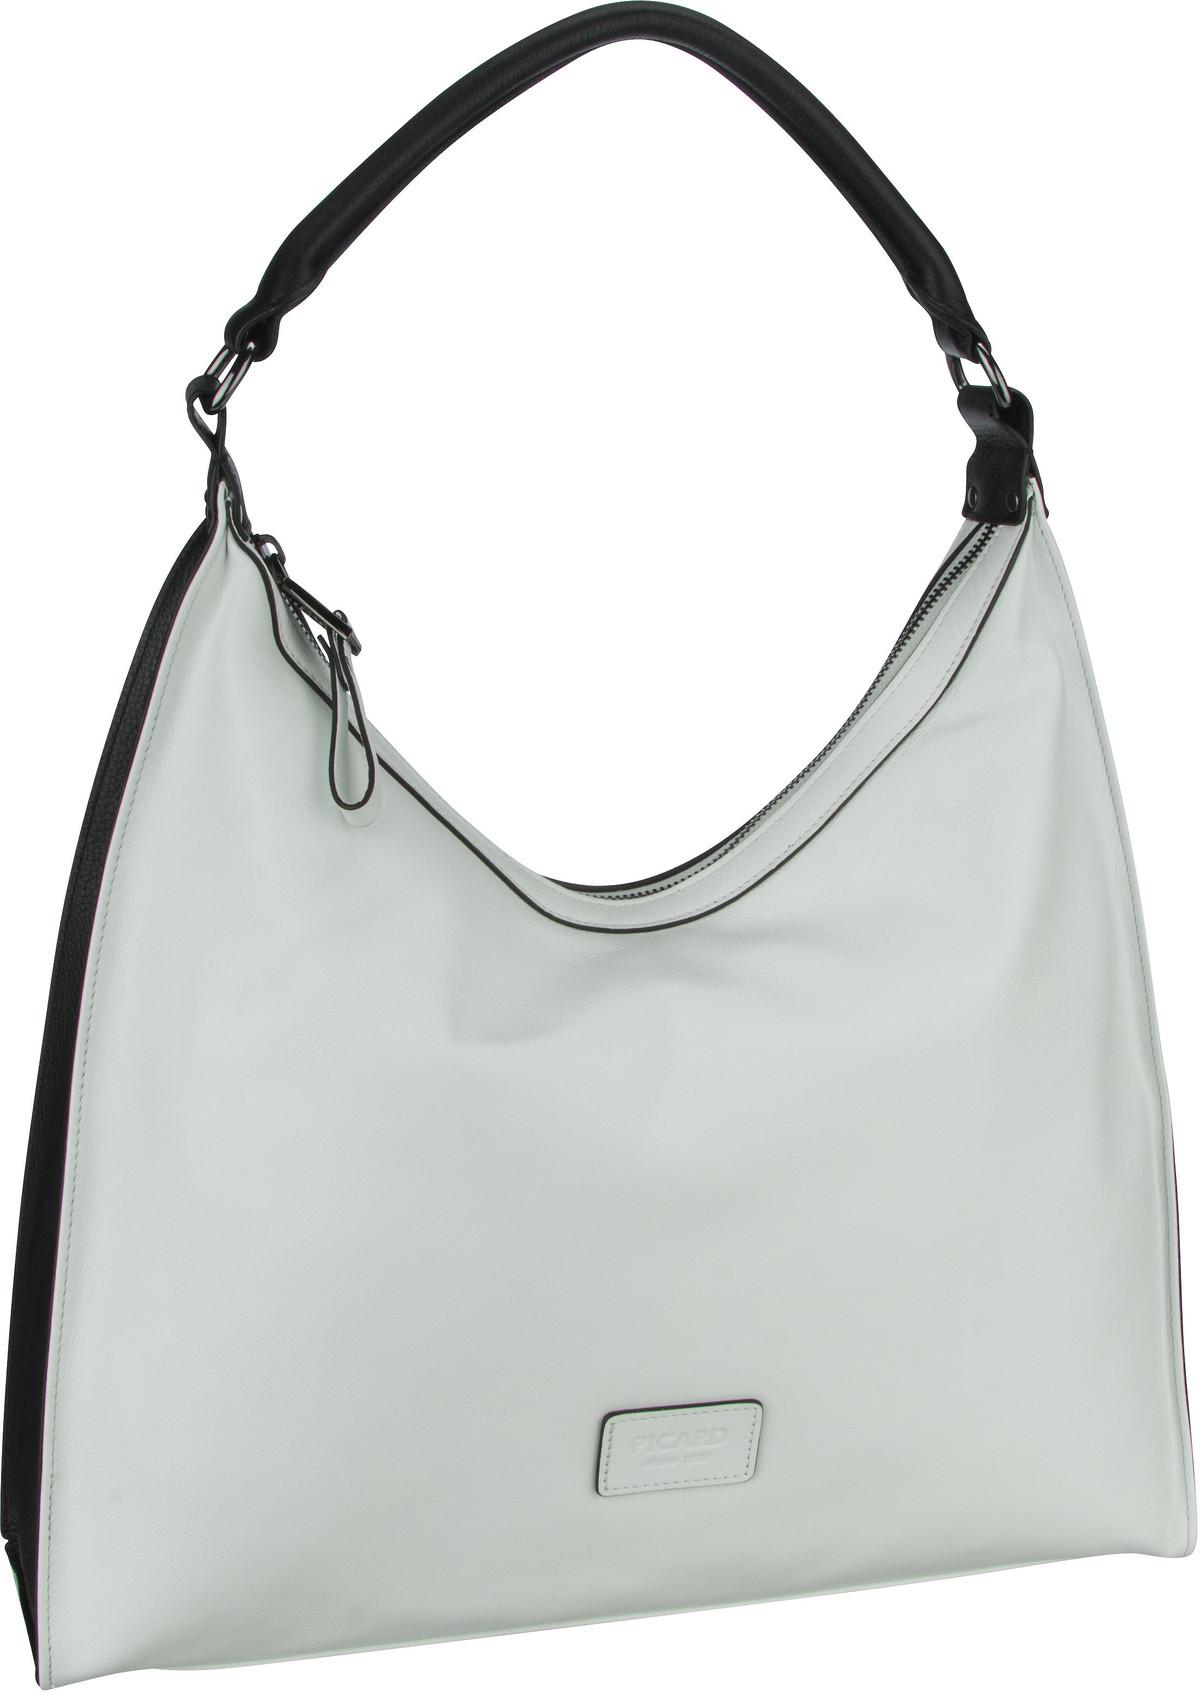 Handtasche Daisy 9772 Weiß/Kombi